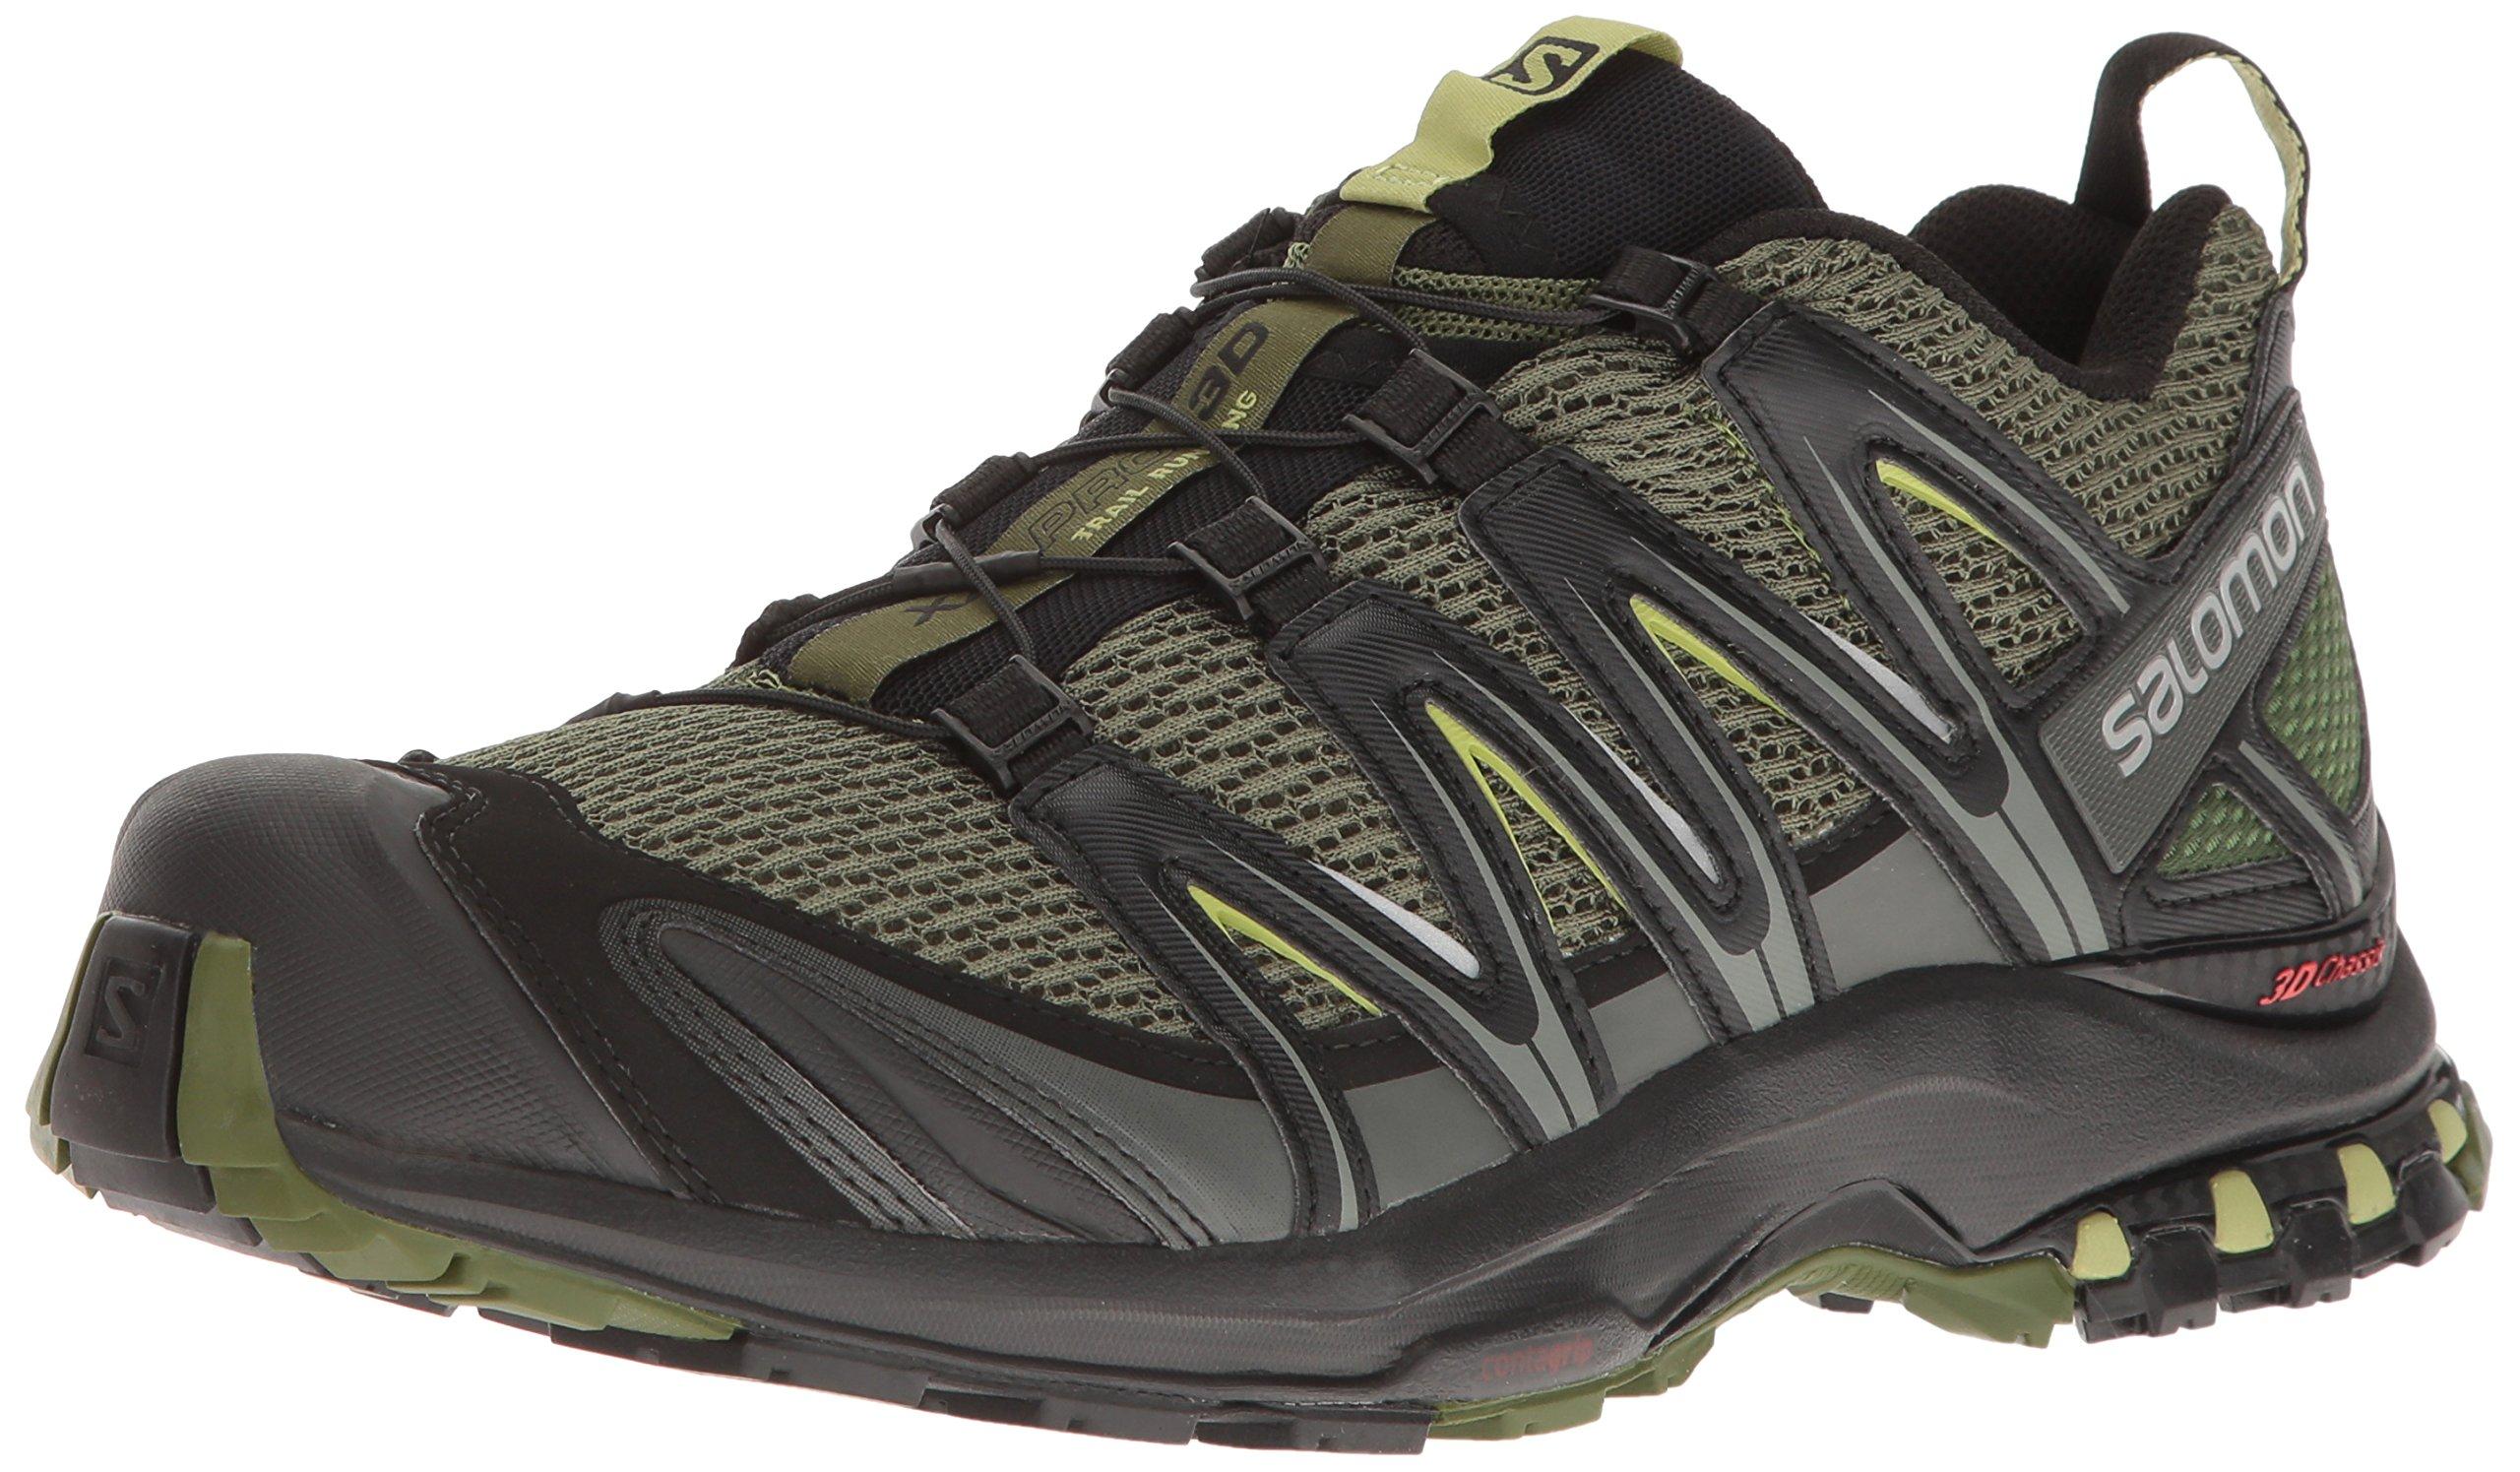 Salomon XA Pro 3D, Zapatillas de Trail Running Hombre product image